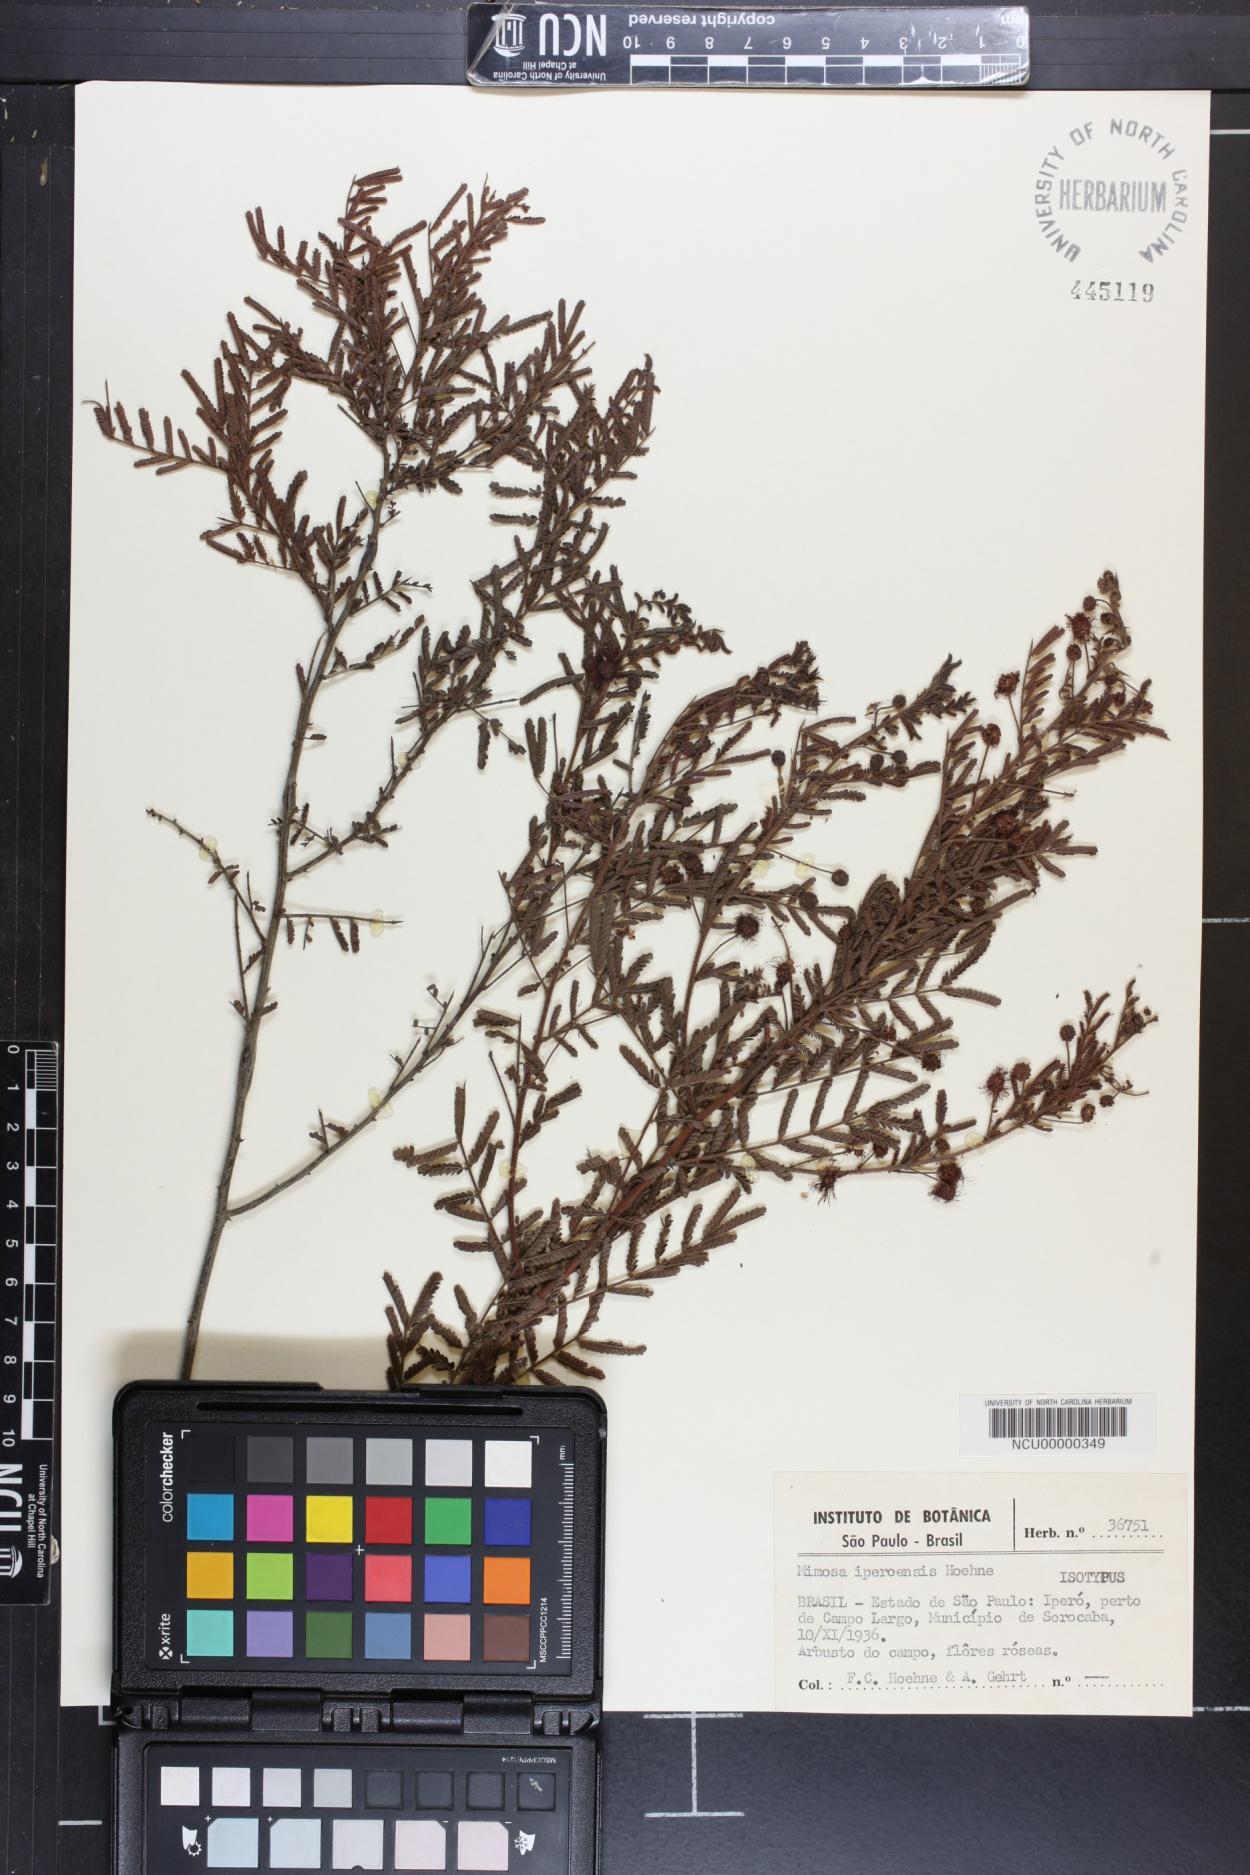 Mimosa iperoensis image